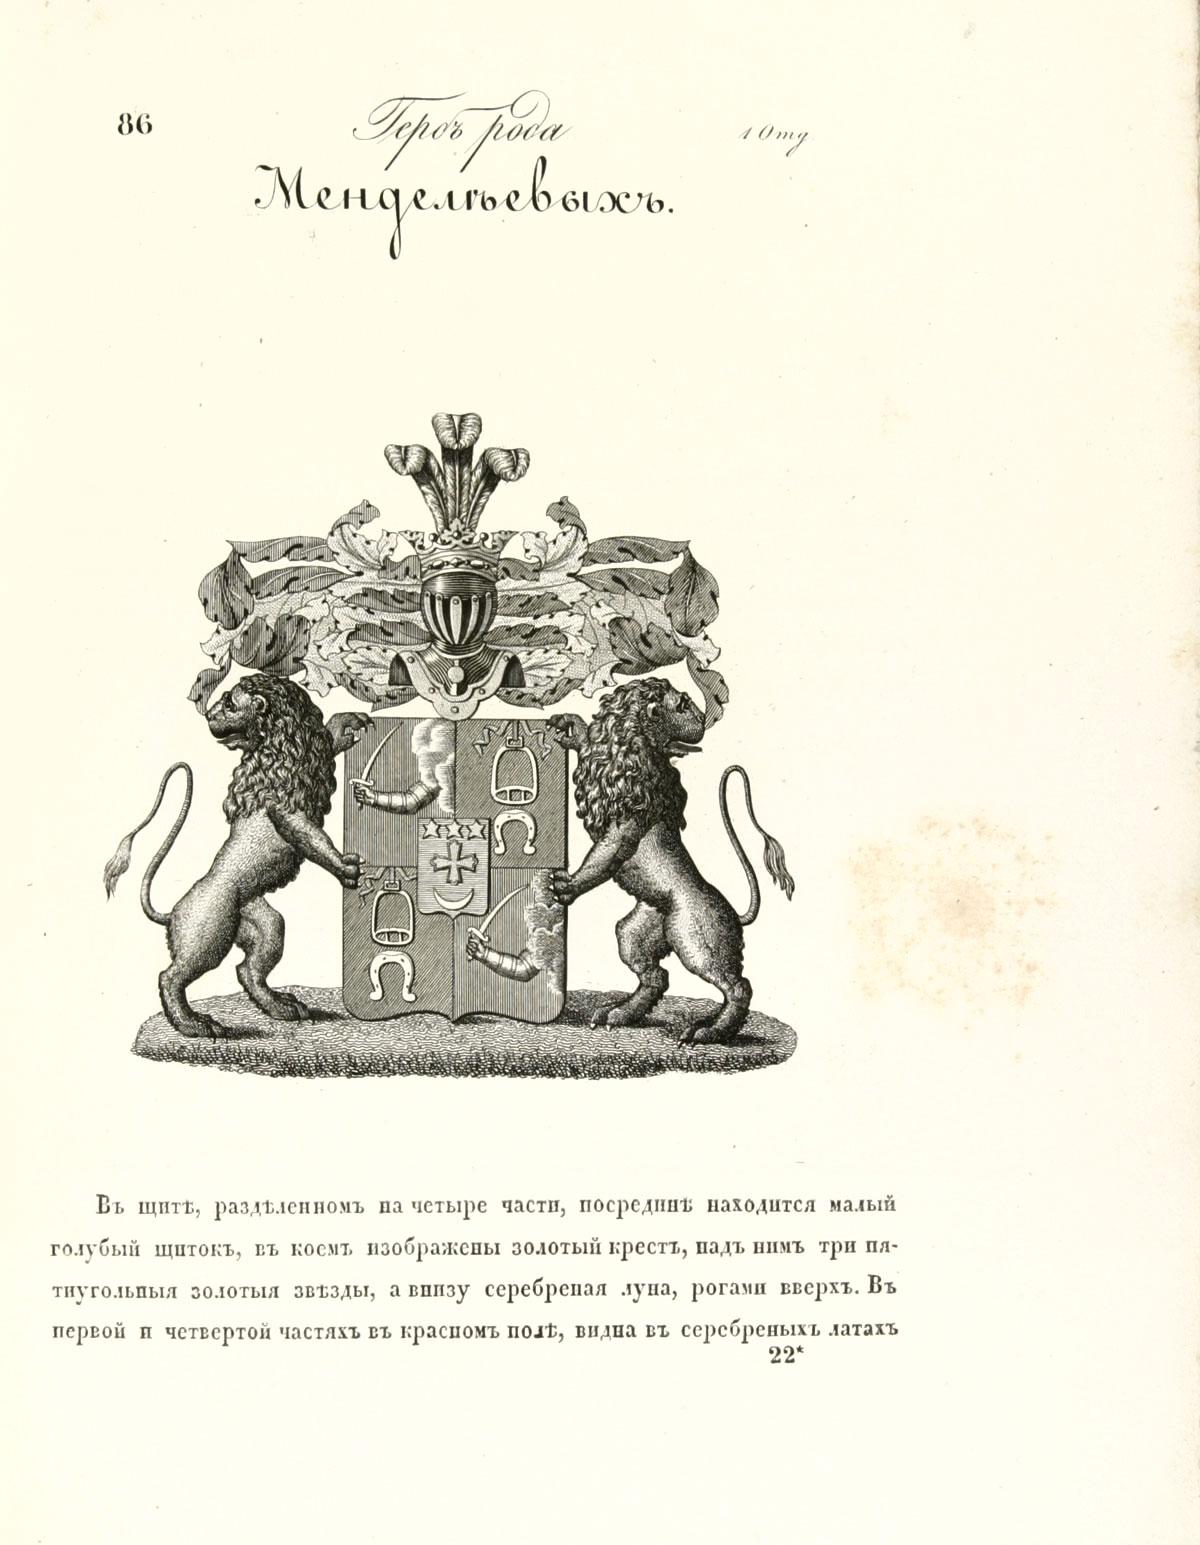 Герб рода Менделеевых, стр. 1